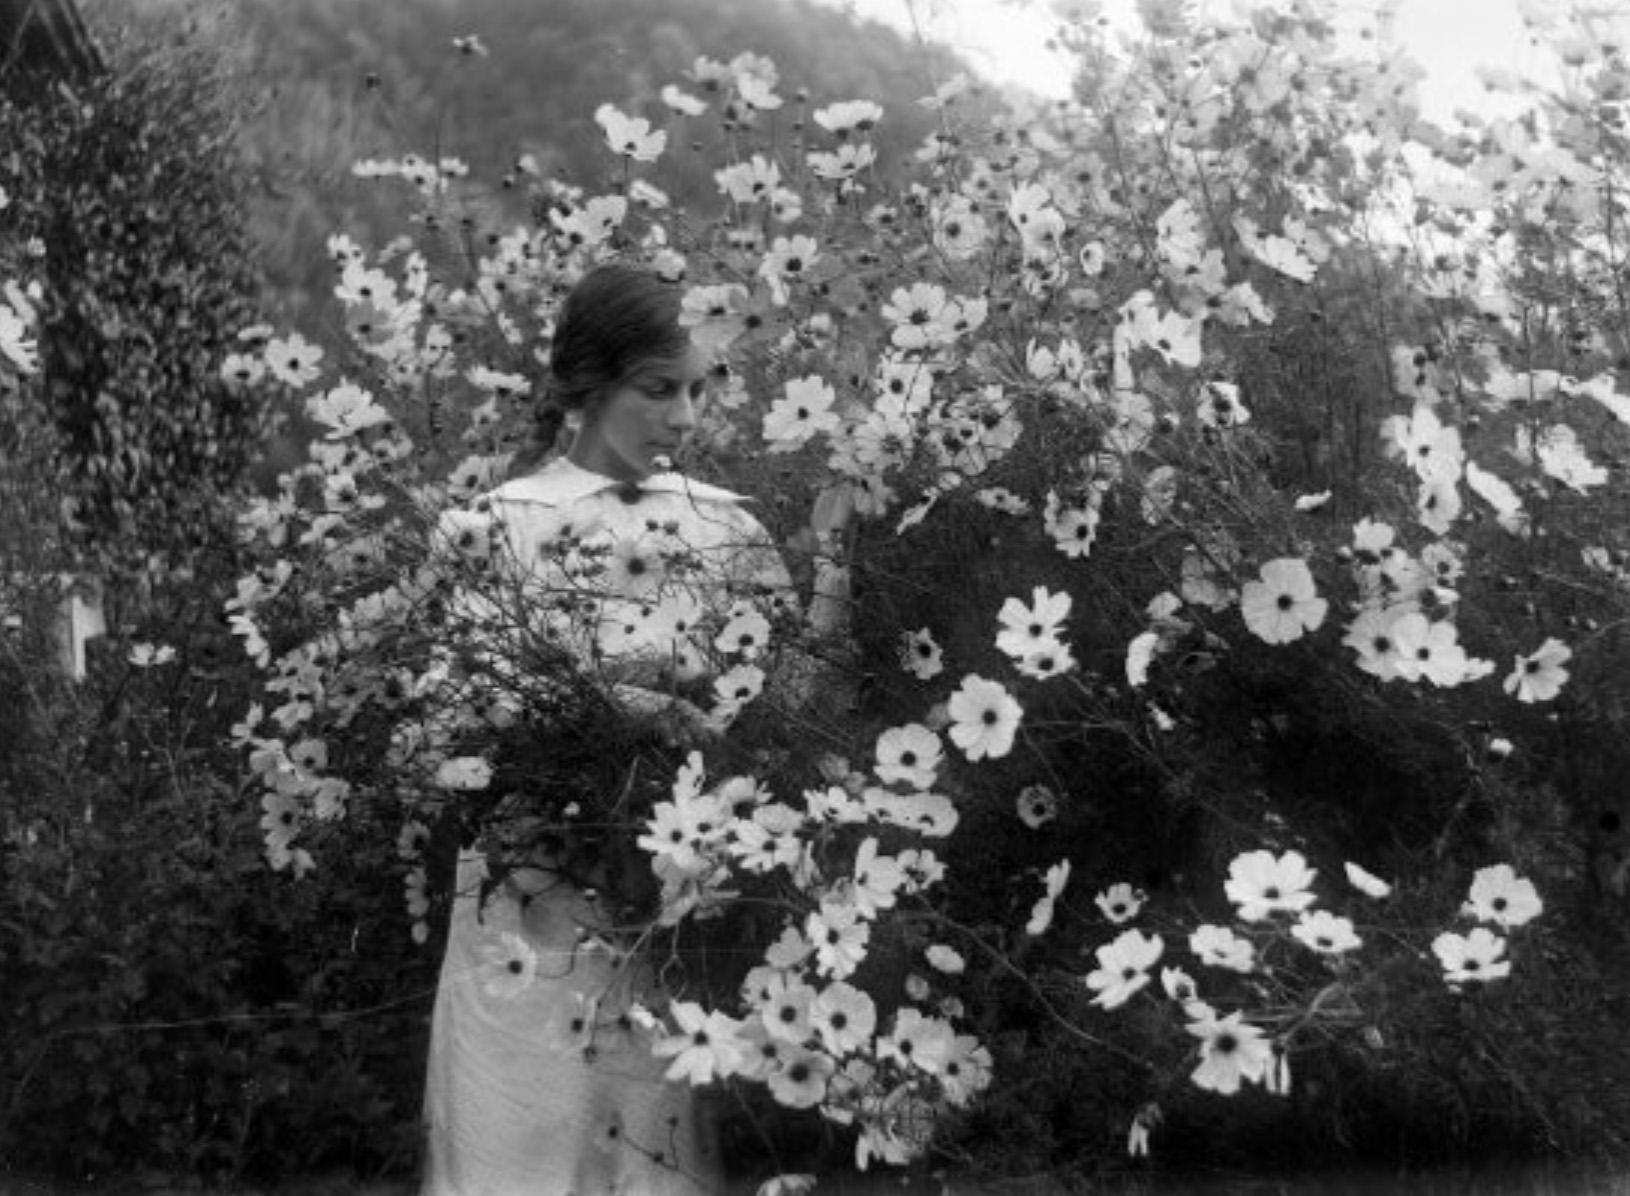 Amy Couper  [1903-1995]    In the Cosmos  circa 1914-1920-Gardiner Collection of Glass Negatives -Copyright Marlborough Museum - Marlborough Historical Society Inc